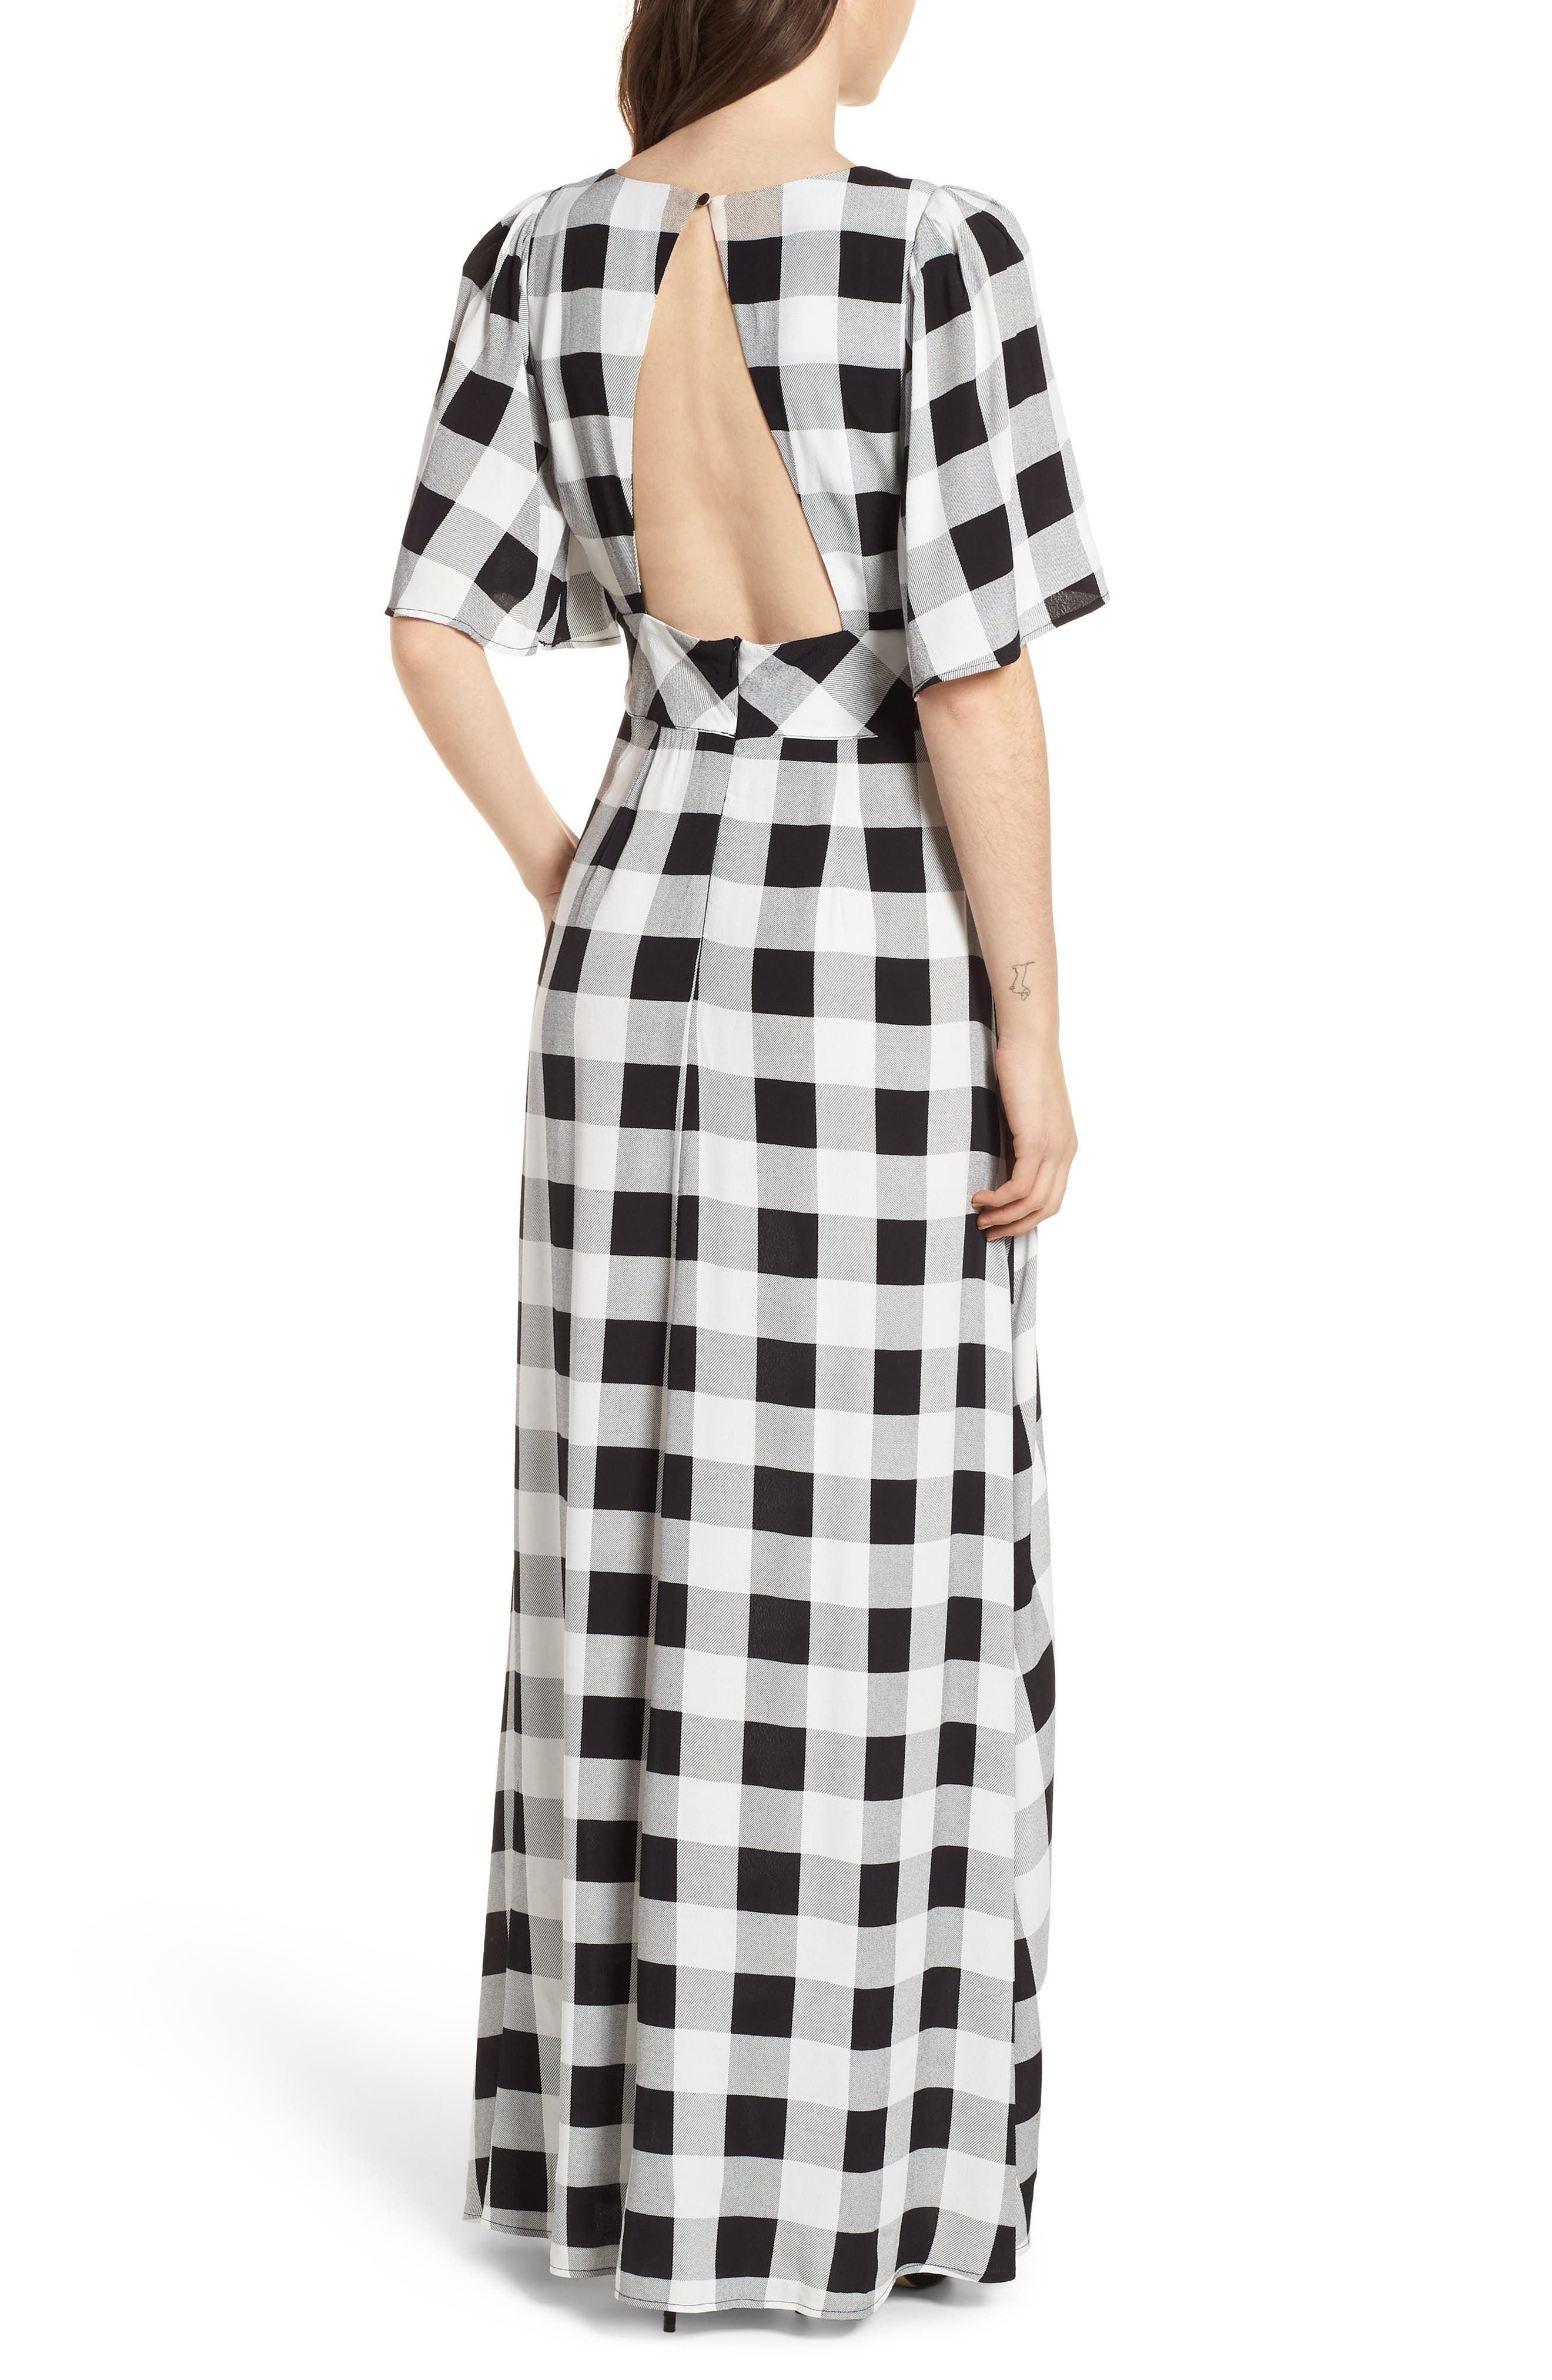 Ramon Tie Front Maxi Dress,                             Alternate thumbnail 2, color,                             Noir Blanc Gingham